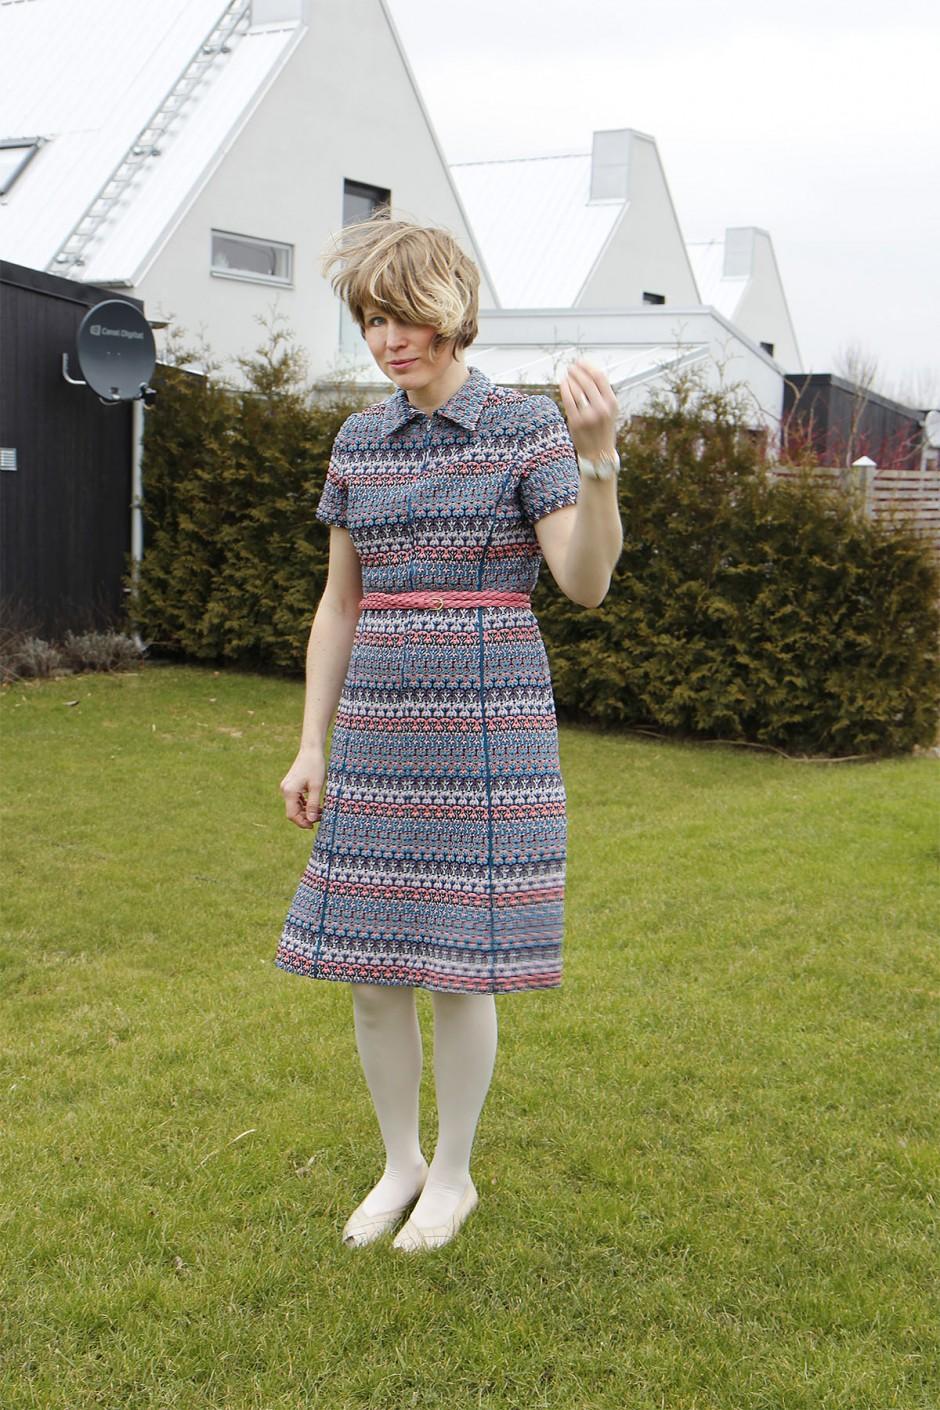 vintageklänning-beyond-retro-malmö